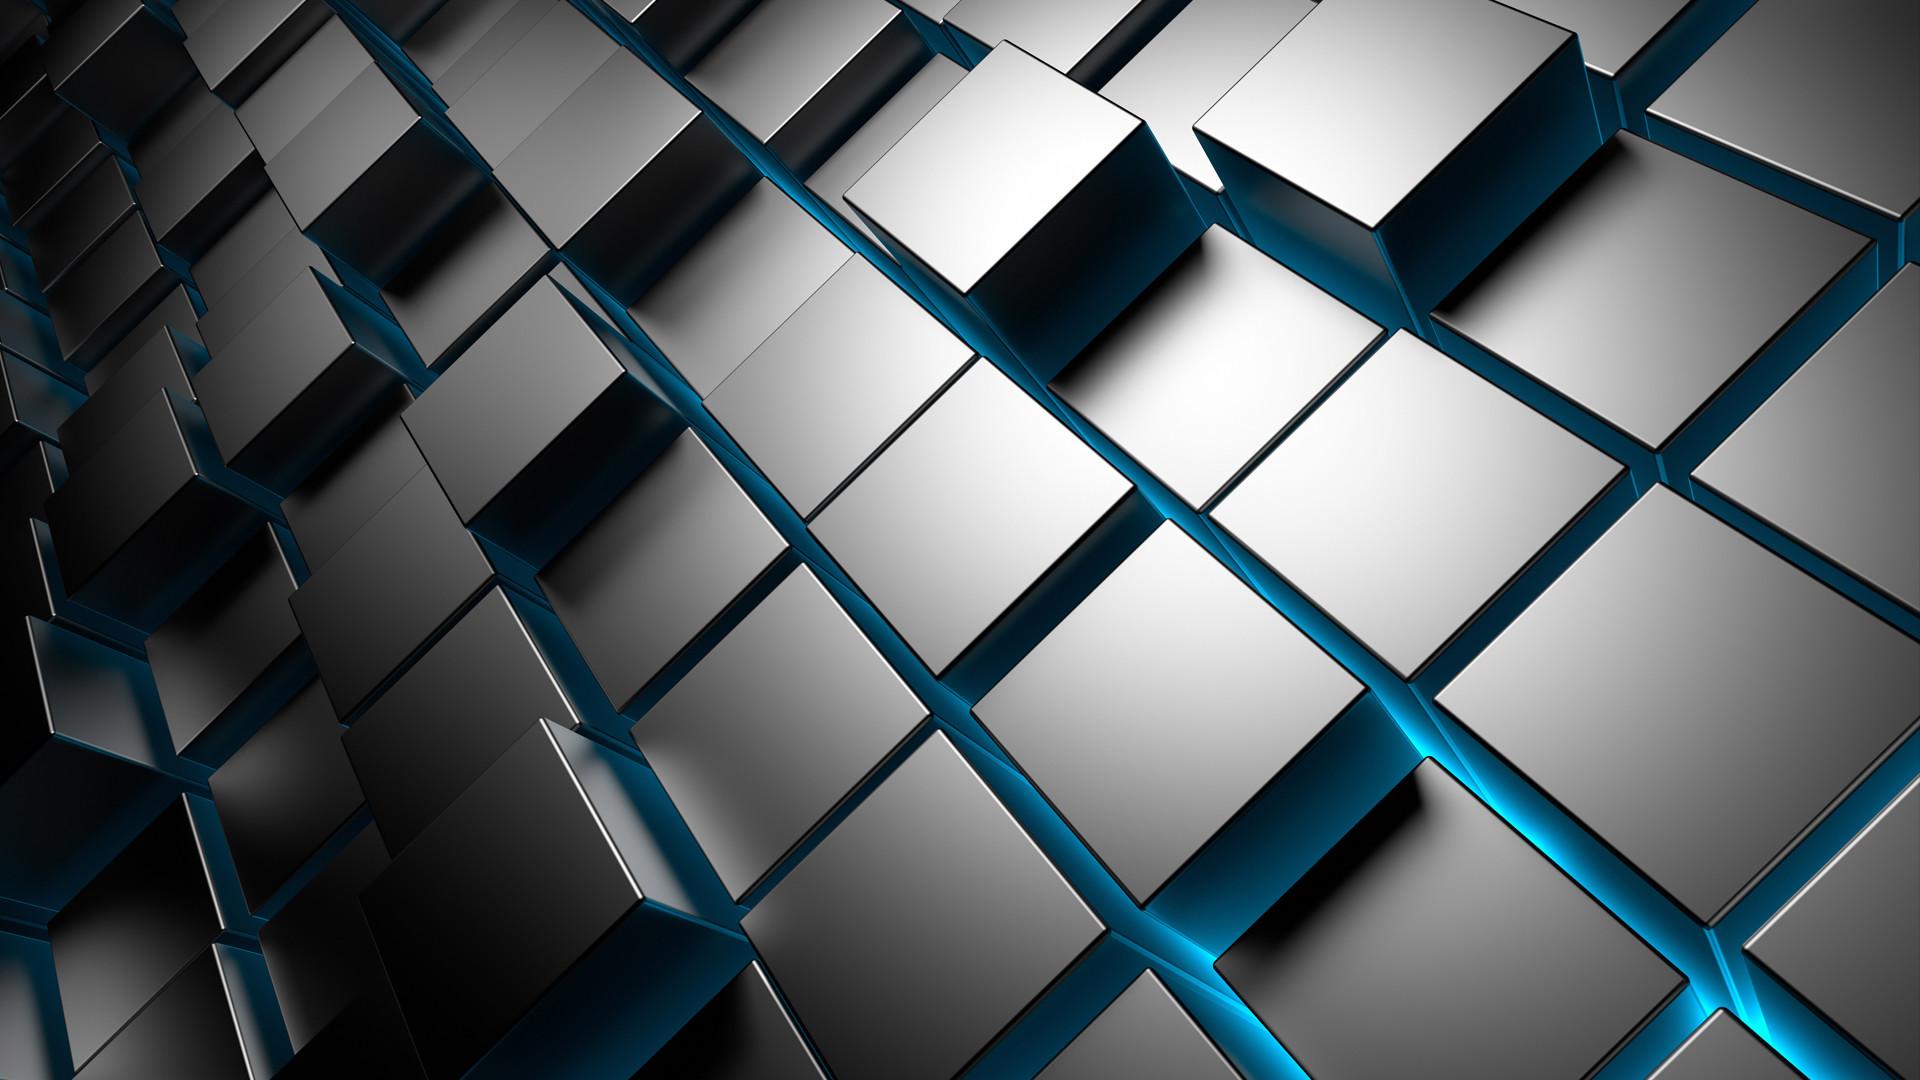 animated matrix wallpaper windows 10 57 images